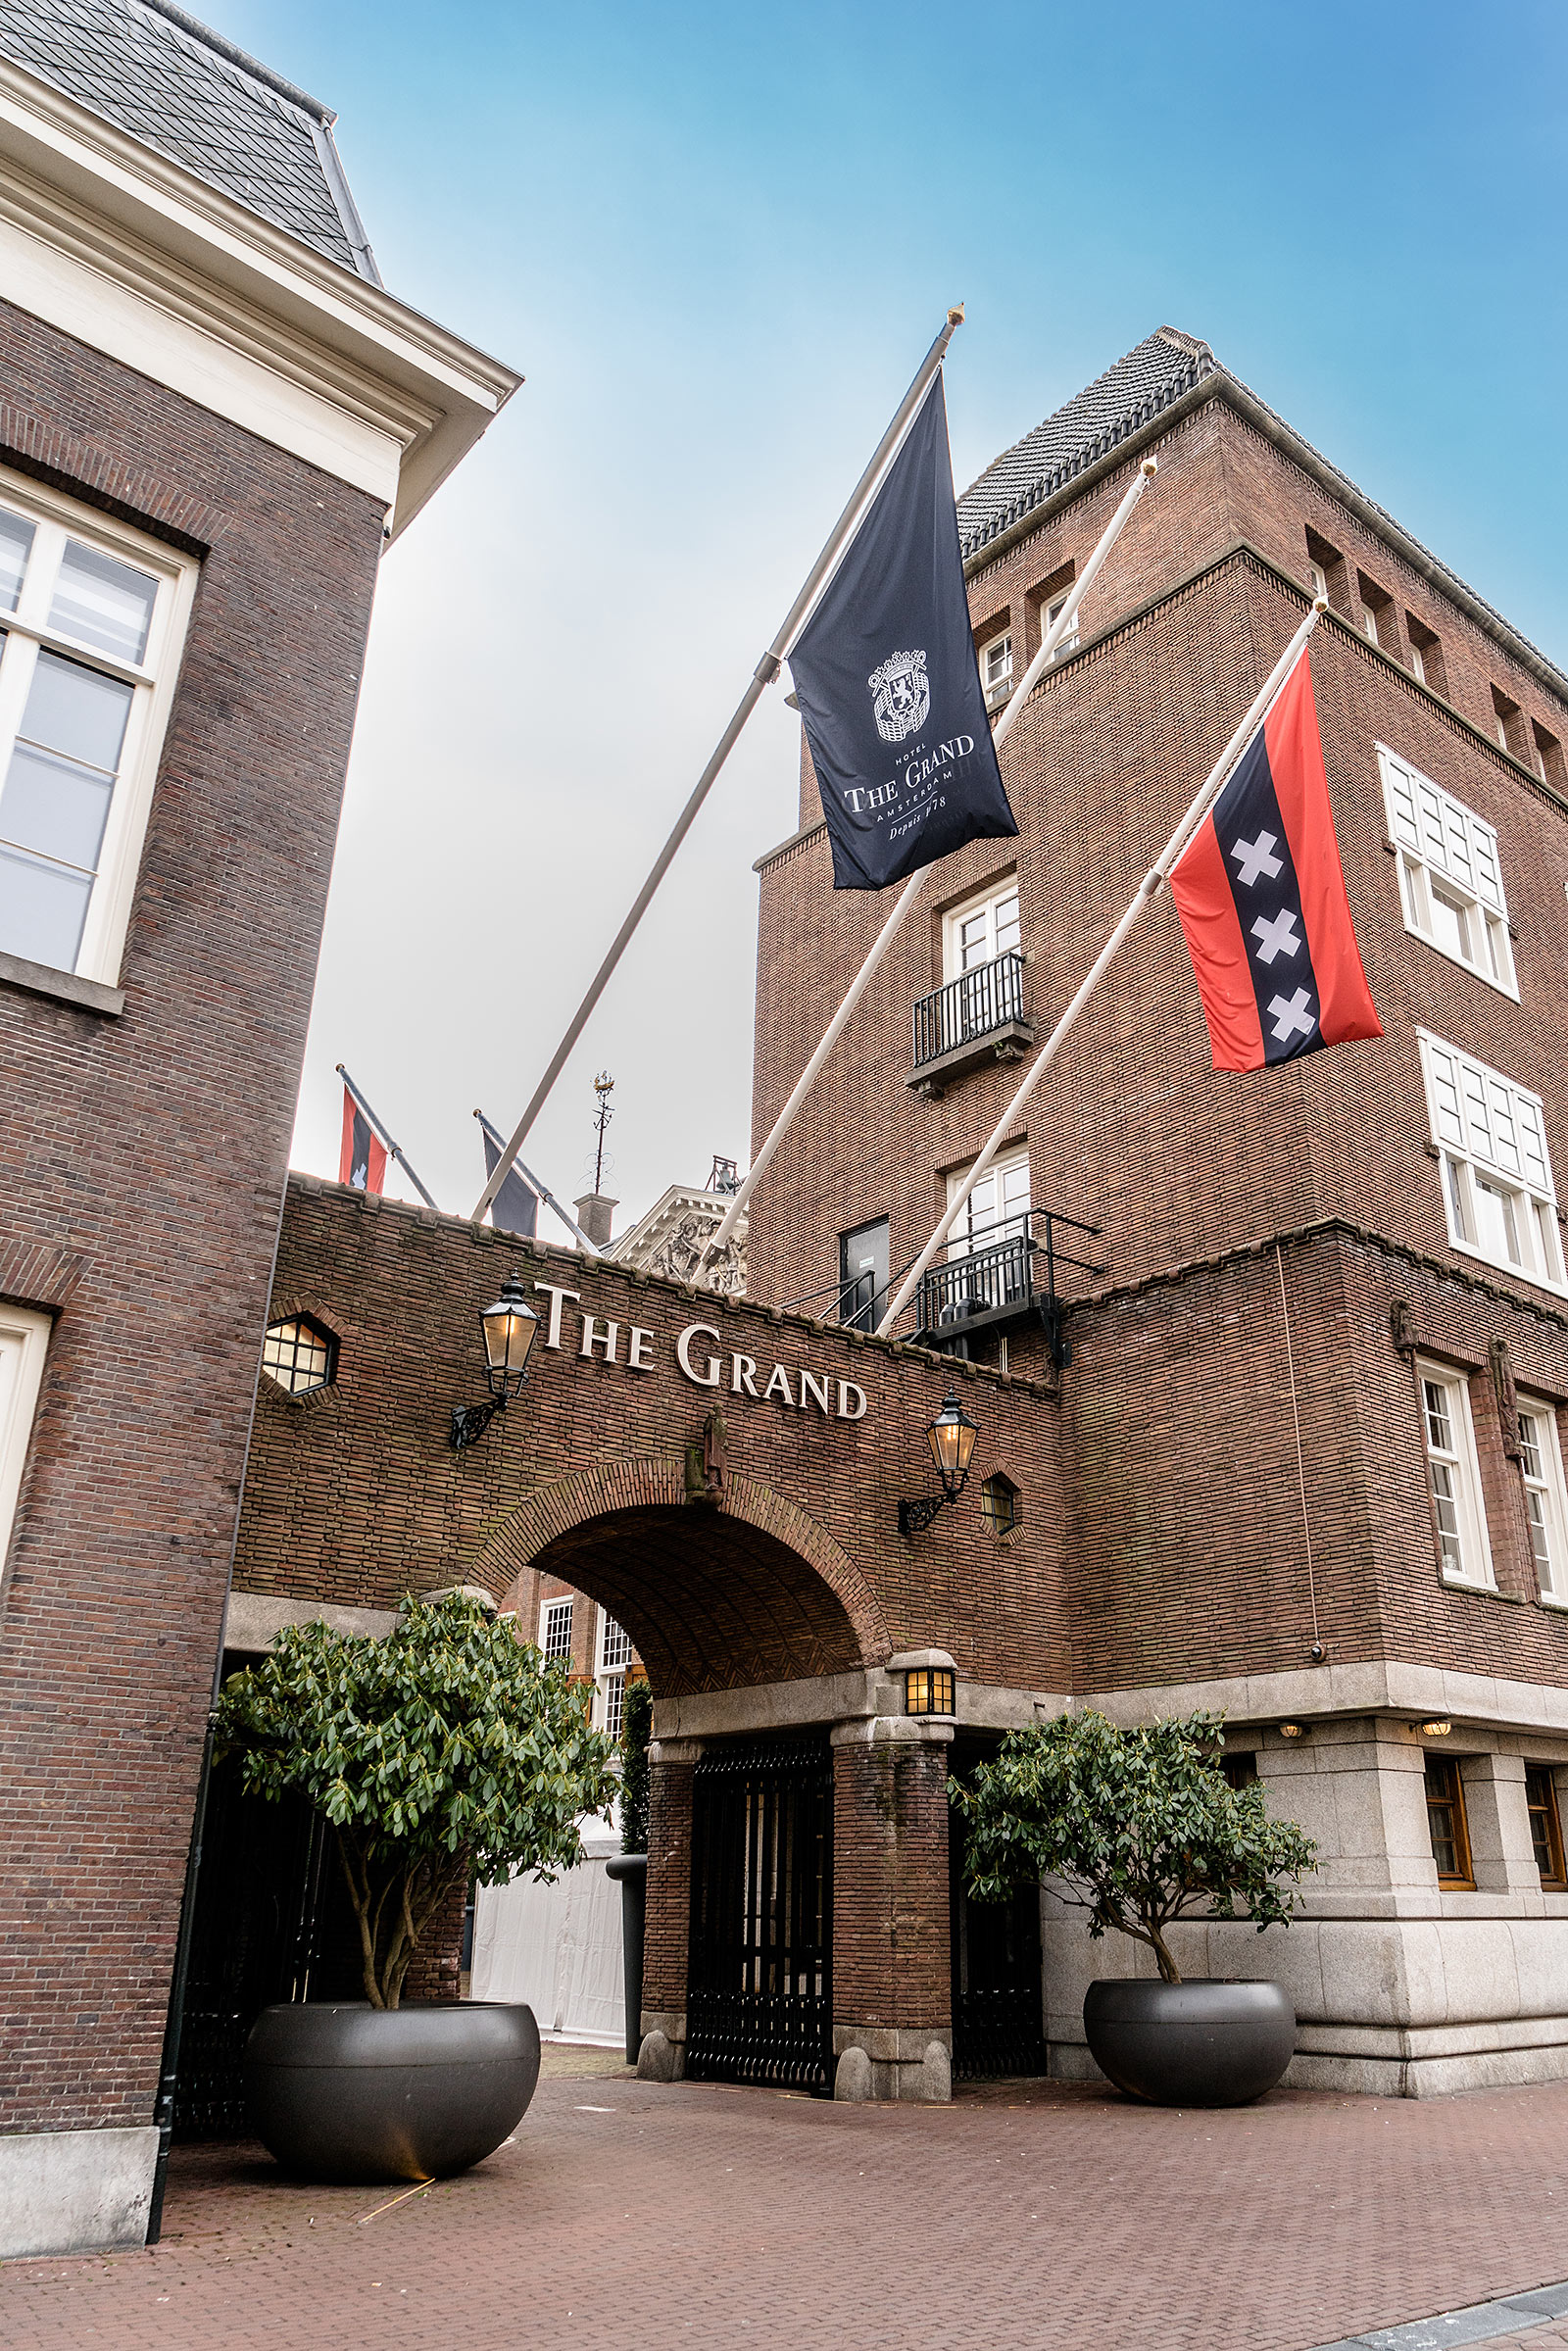 sofitel the grand amsterdam hotel travel blog sunnyinga